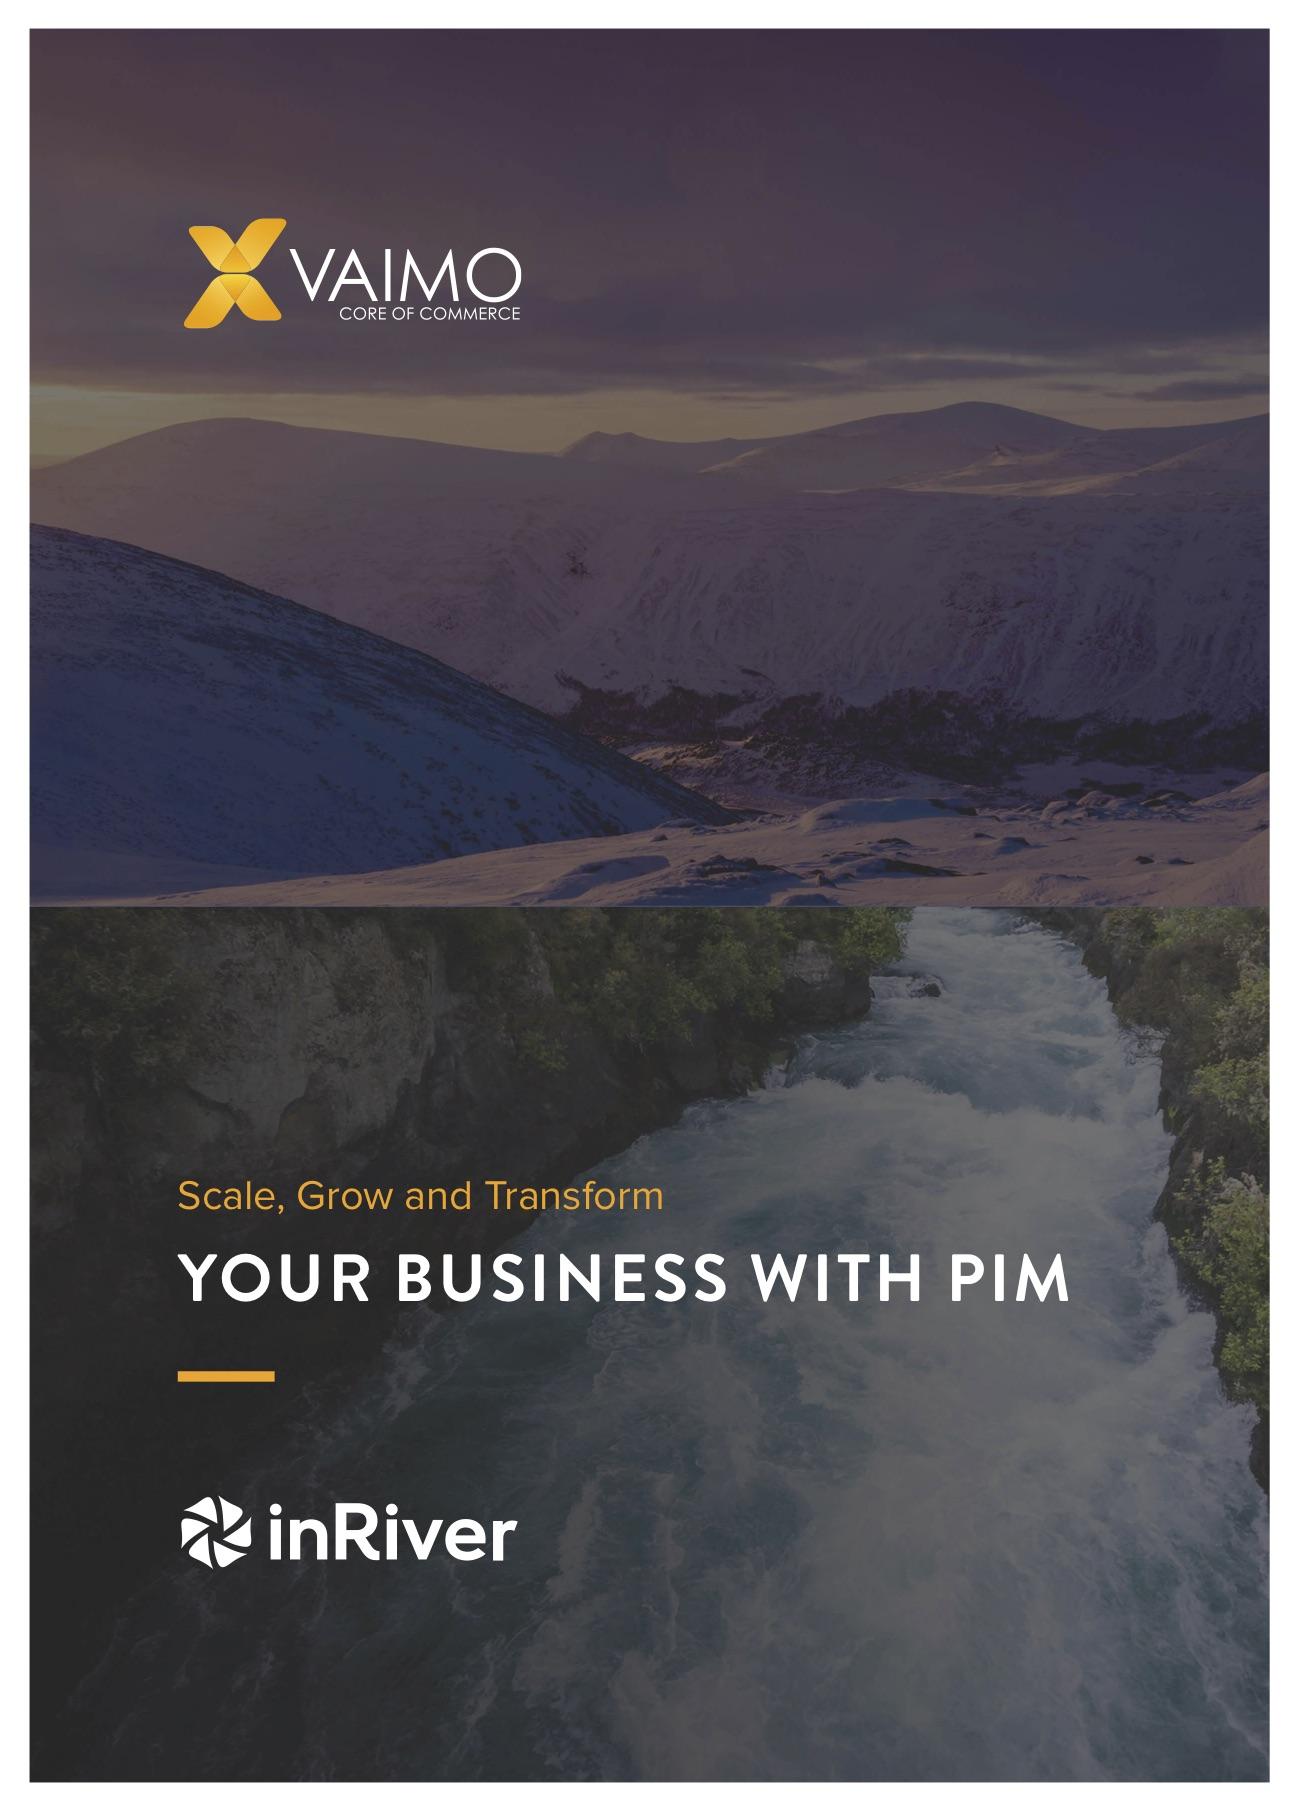 inRiver PIM whitepaper